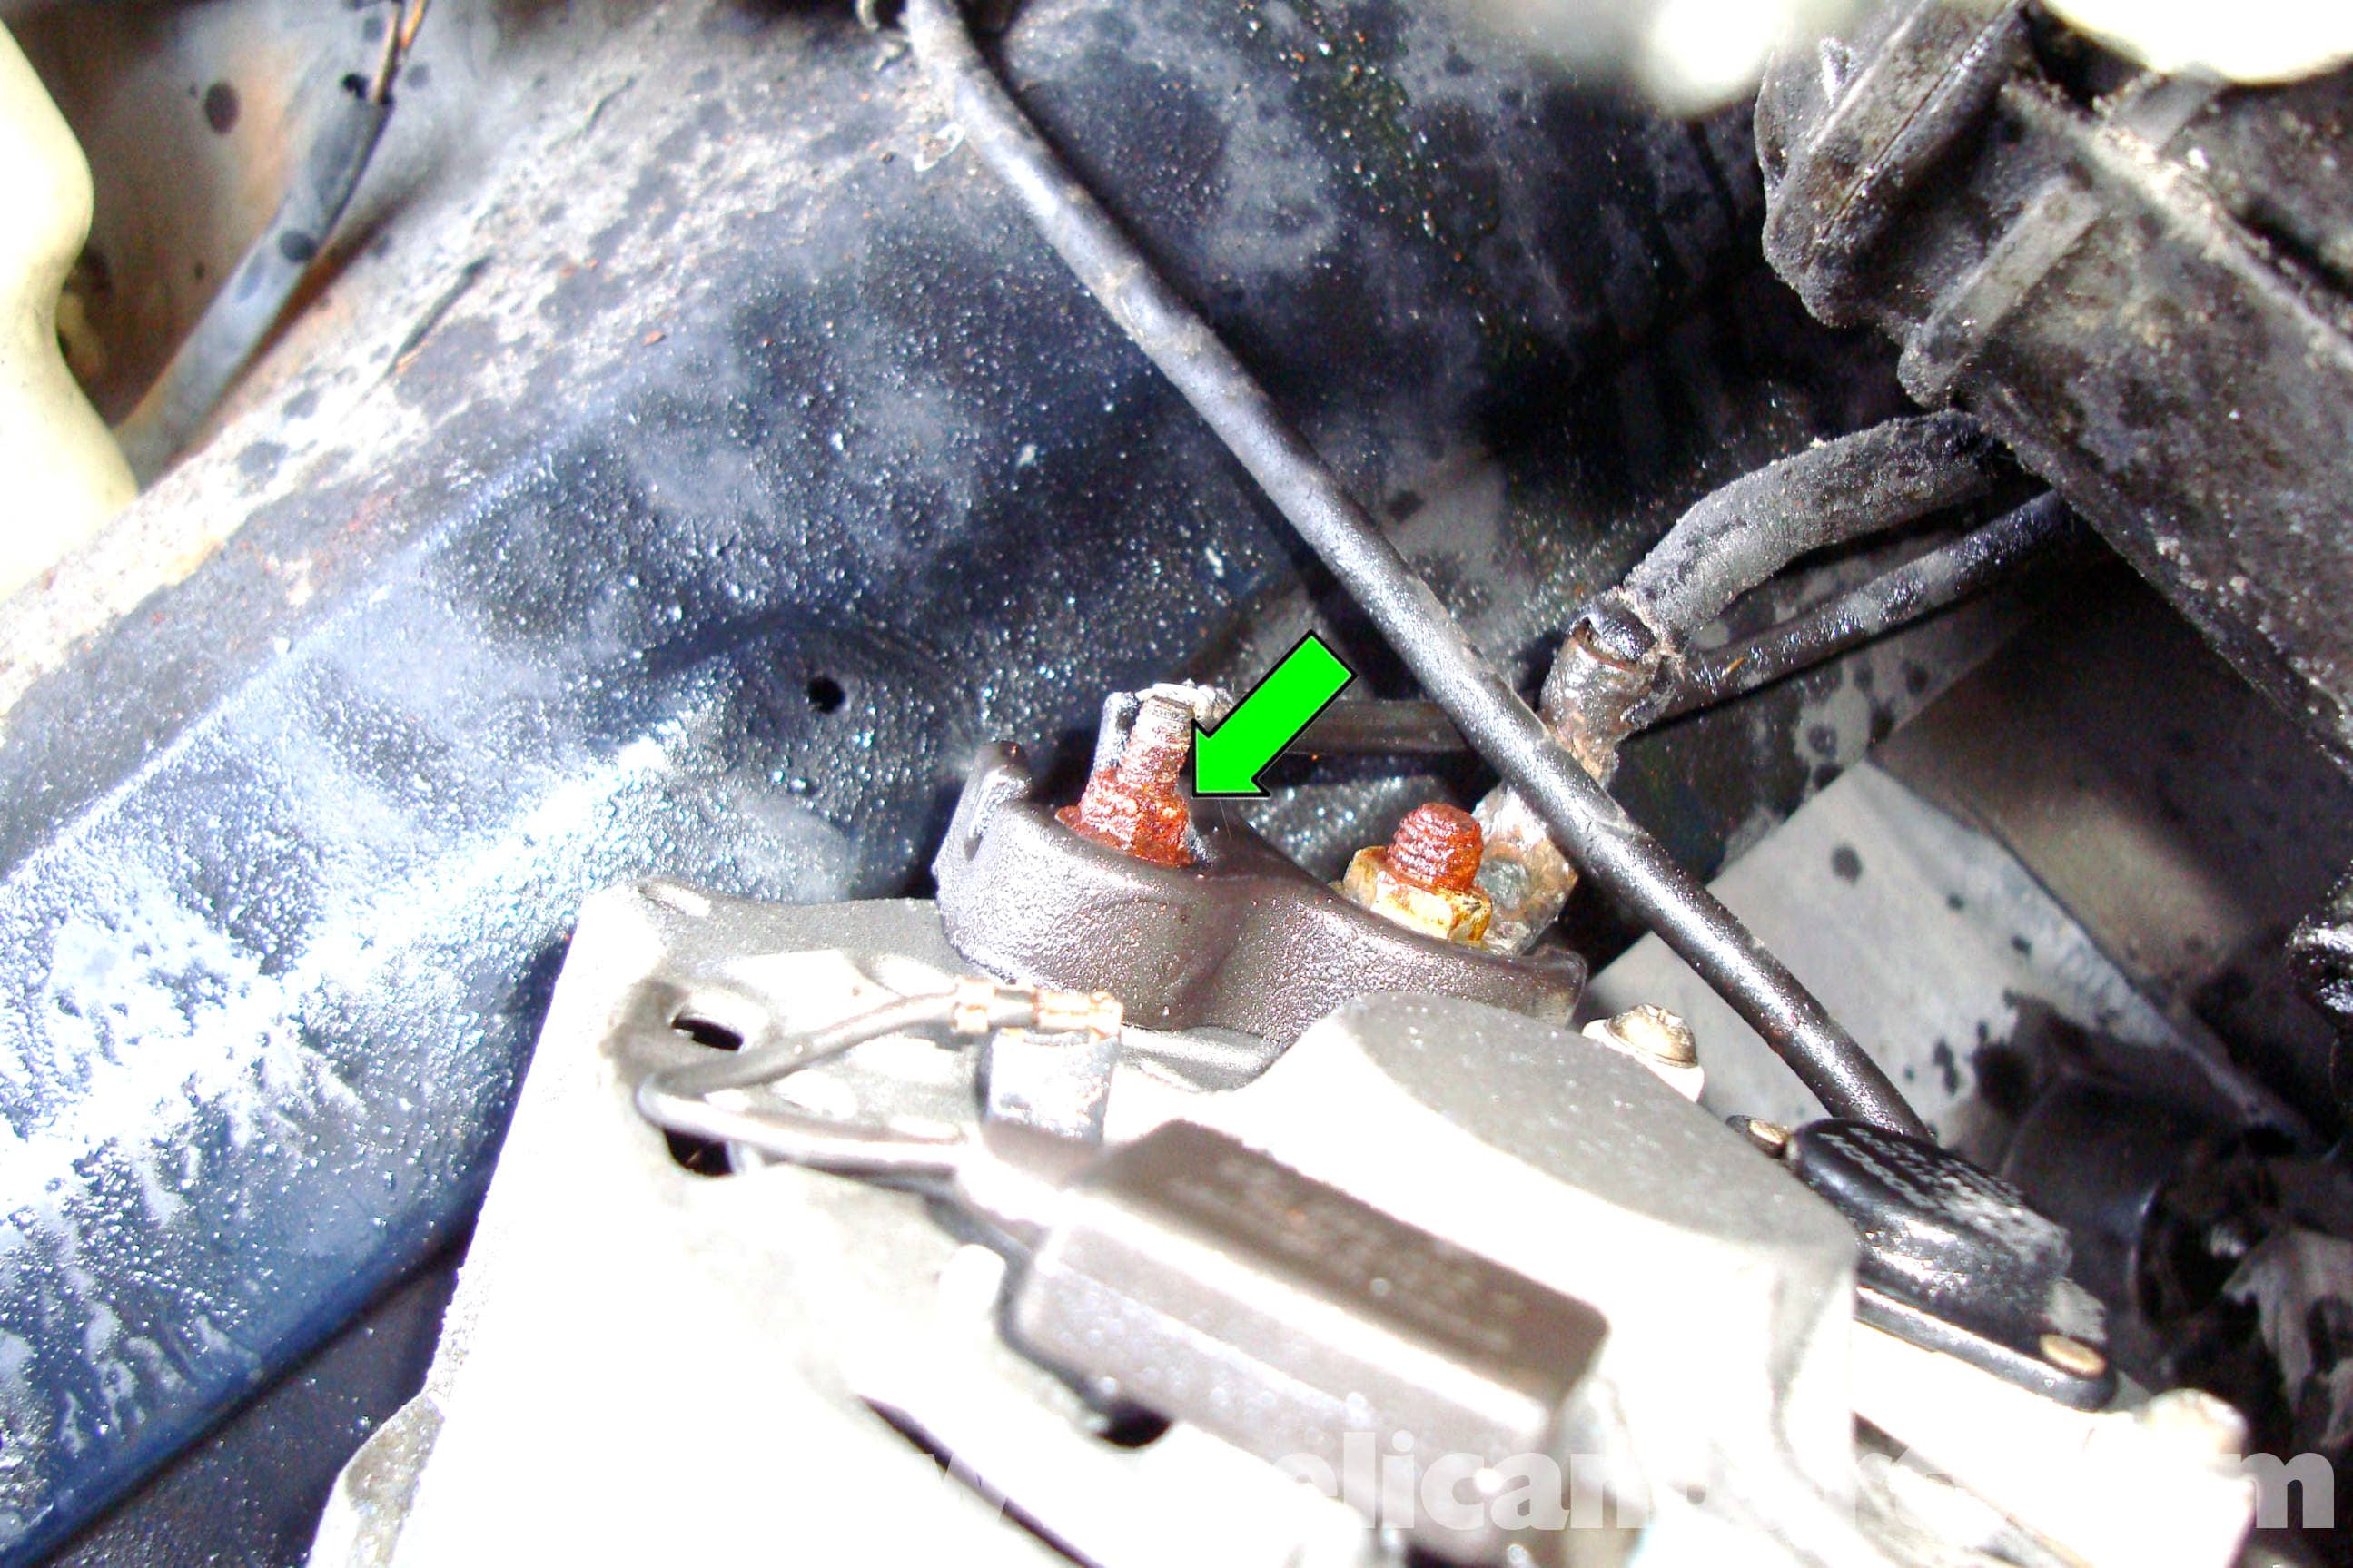 Pleasant Mercedes Benz R129 Alternator Removal Sl500 500Sl 1990 2002 Wiring Database Lukepterrageneticorg